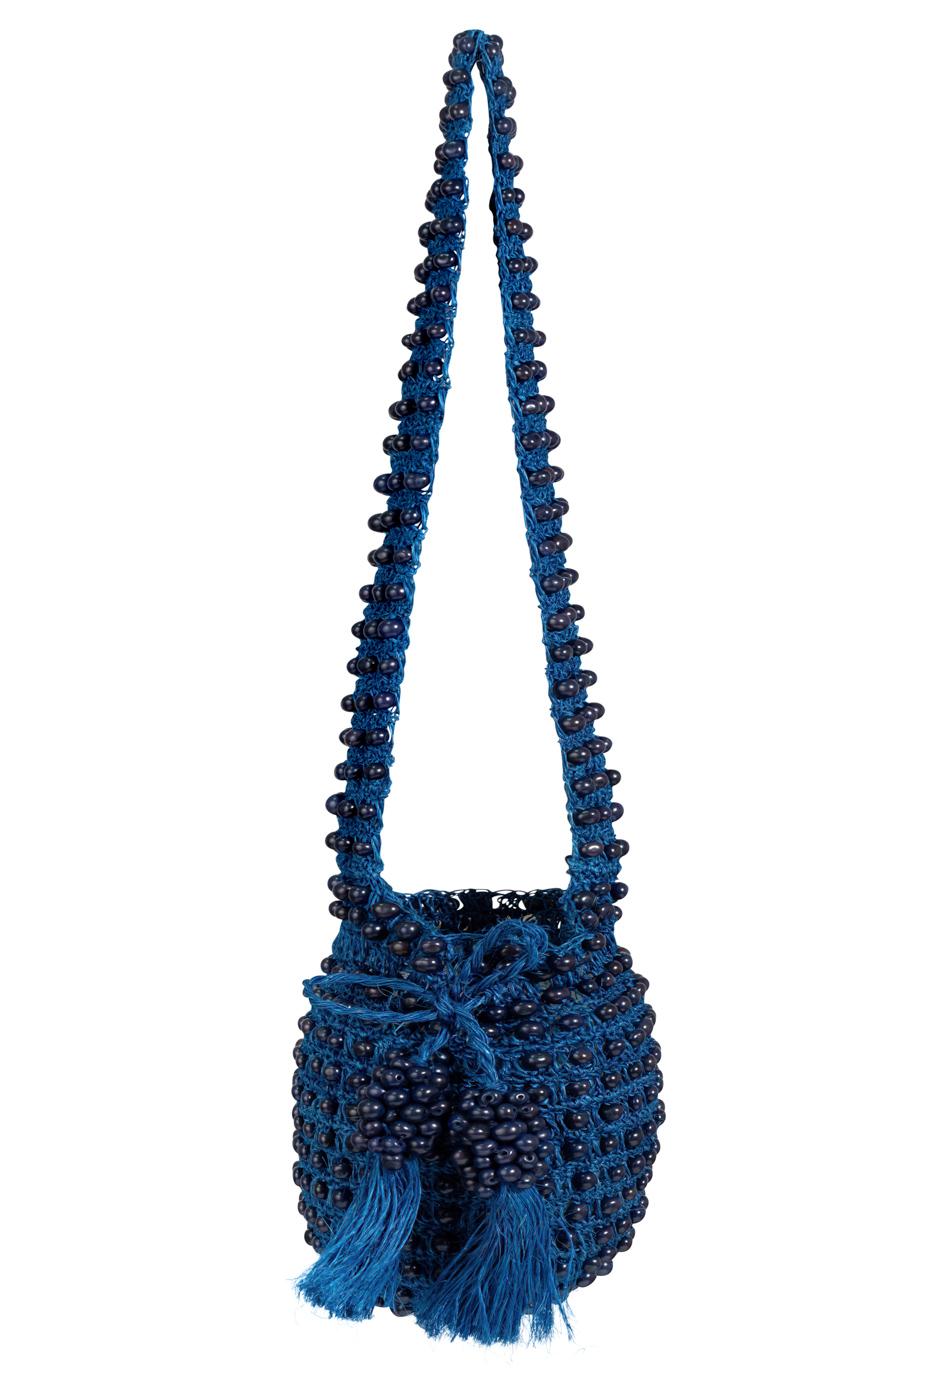 Mochila fique tagua- azul rey